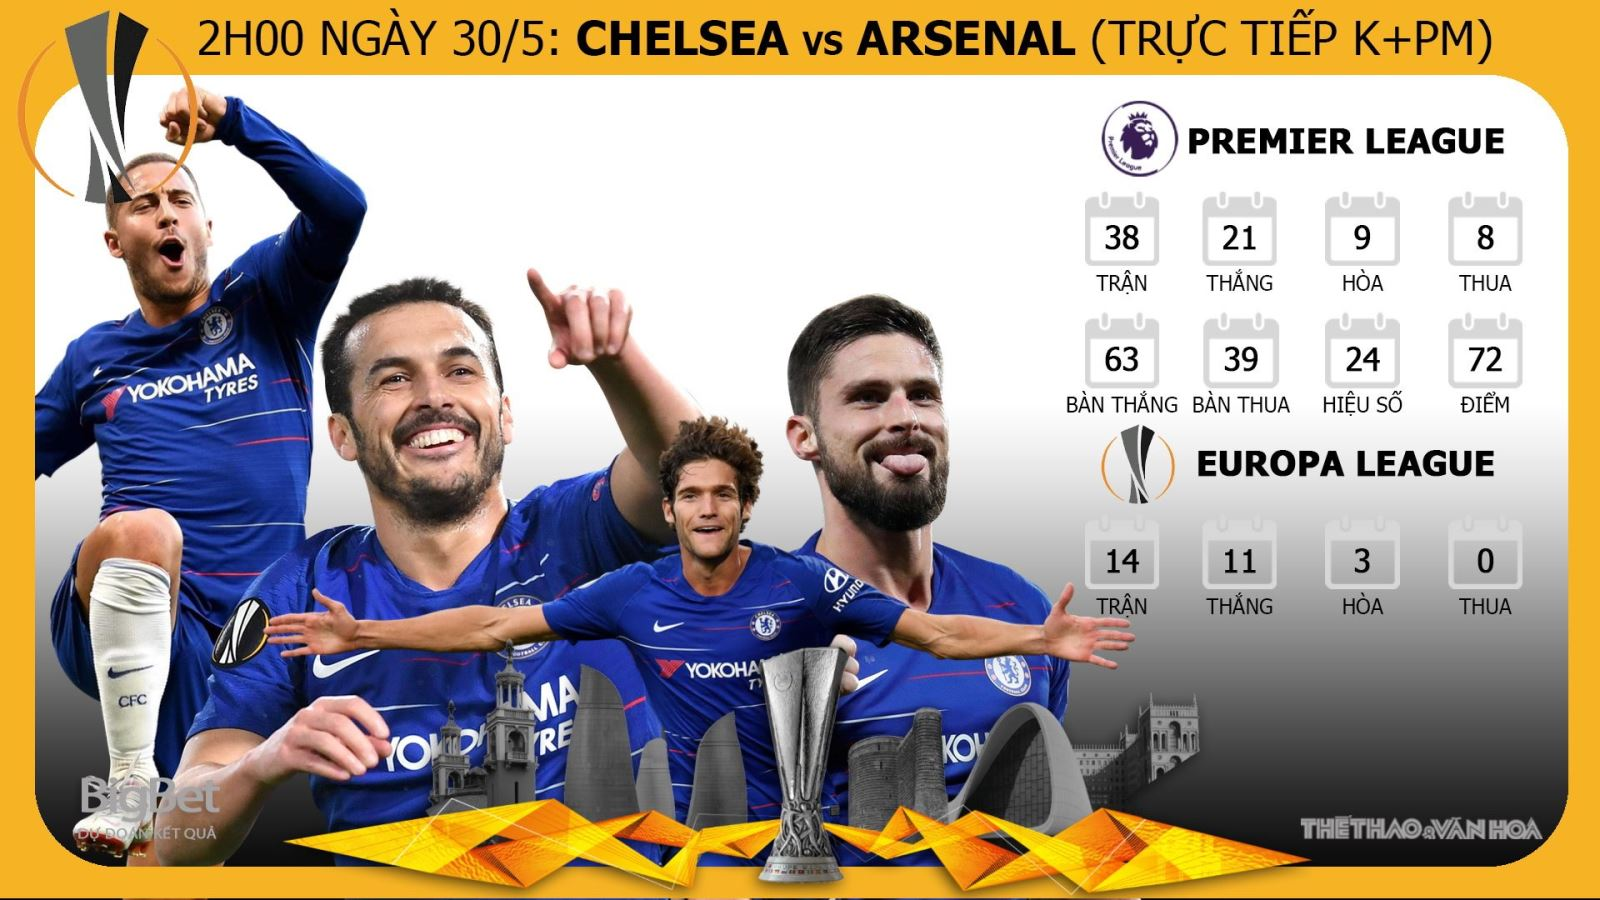 Chelsea vs Arsenal, Arsenal vs Chelsea, soi kèo Chelsea vs Arsenal, soi kèo bóng đá, truc tiep bong da, trực tiếp bóng đá, trực tiếp Arsenal vs Chelsea, C2, Cúp C2